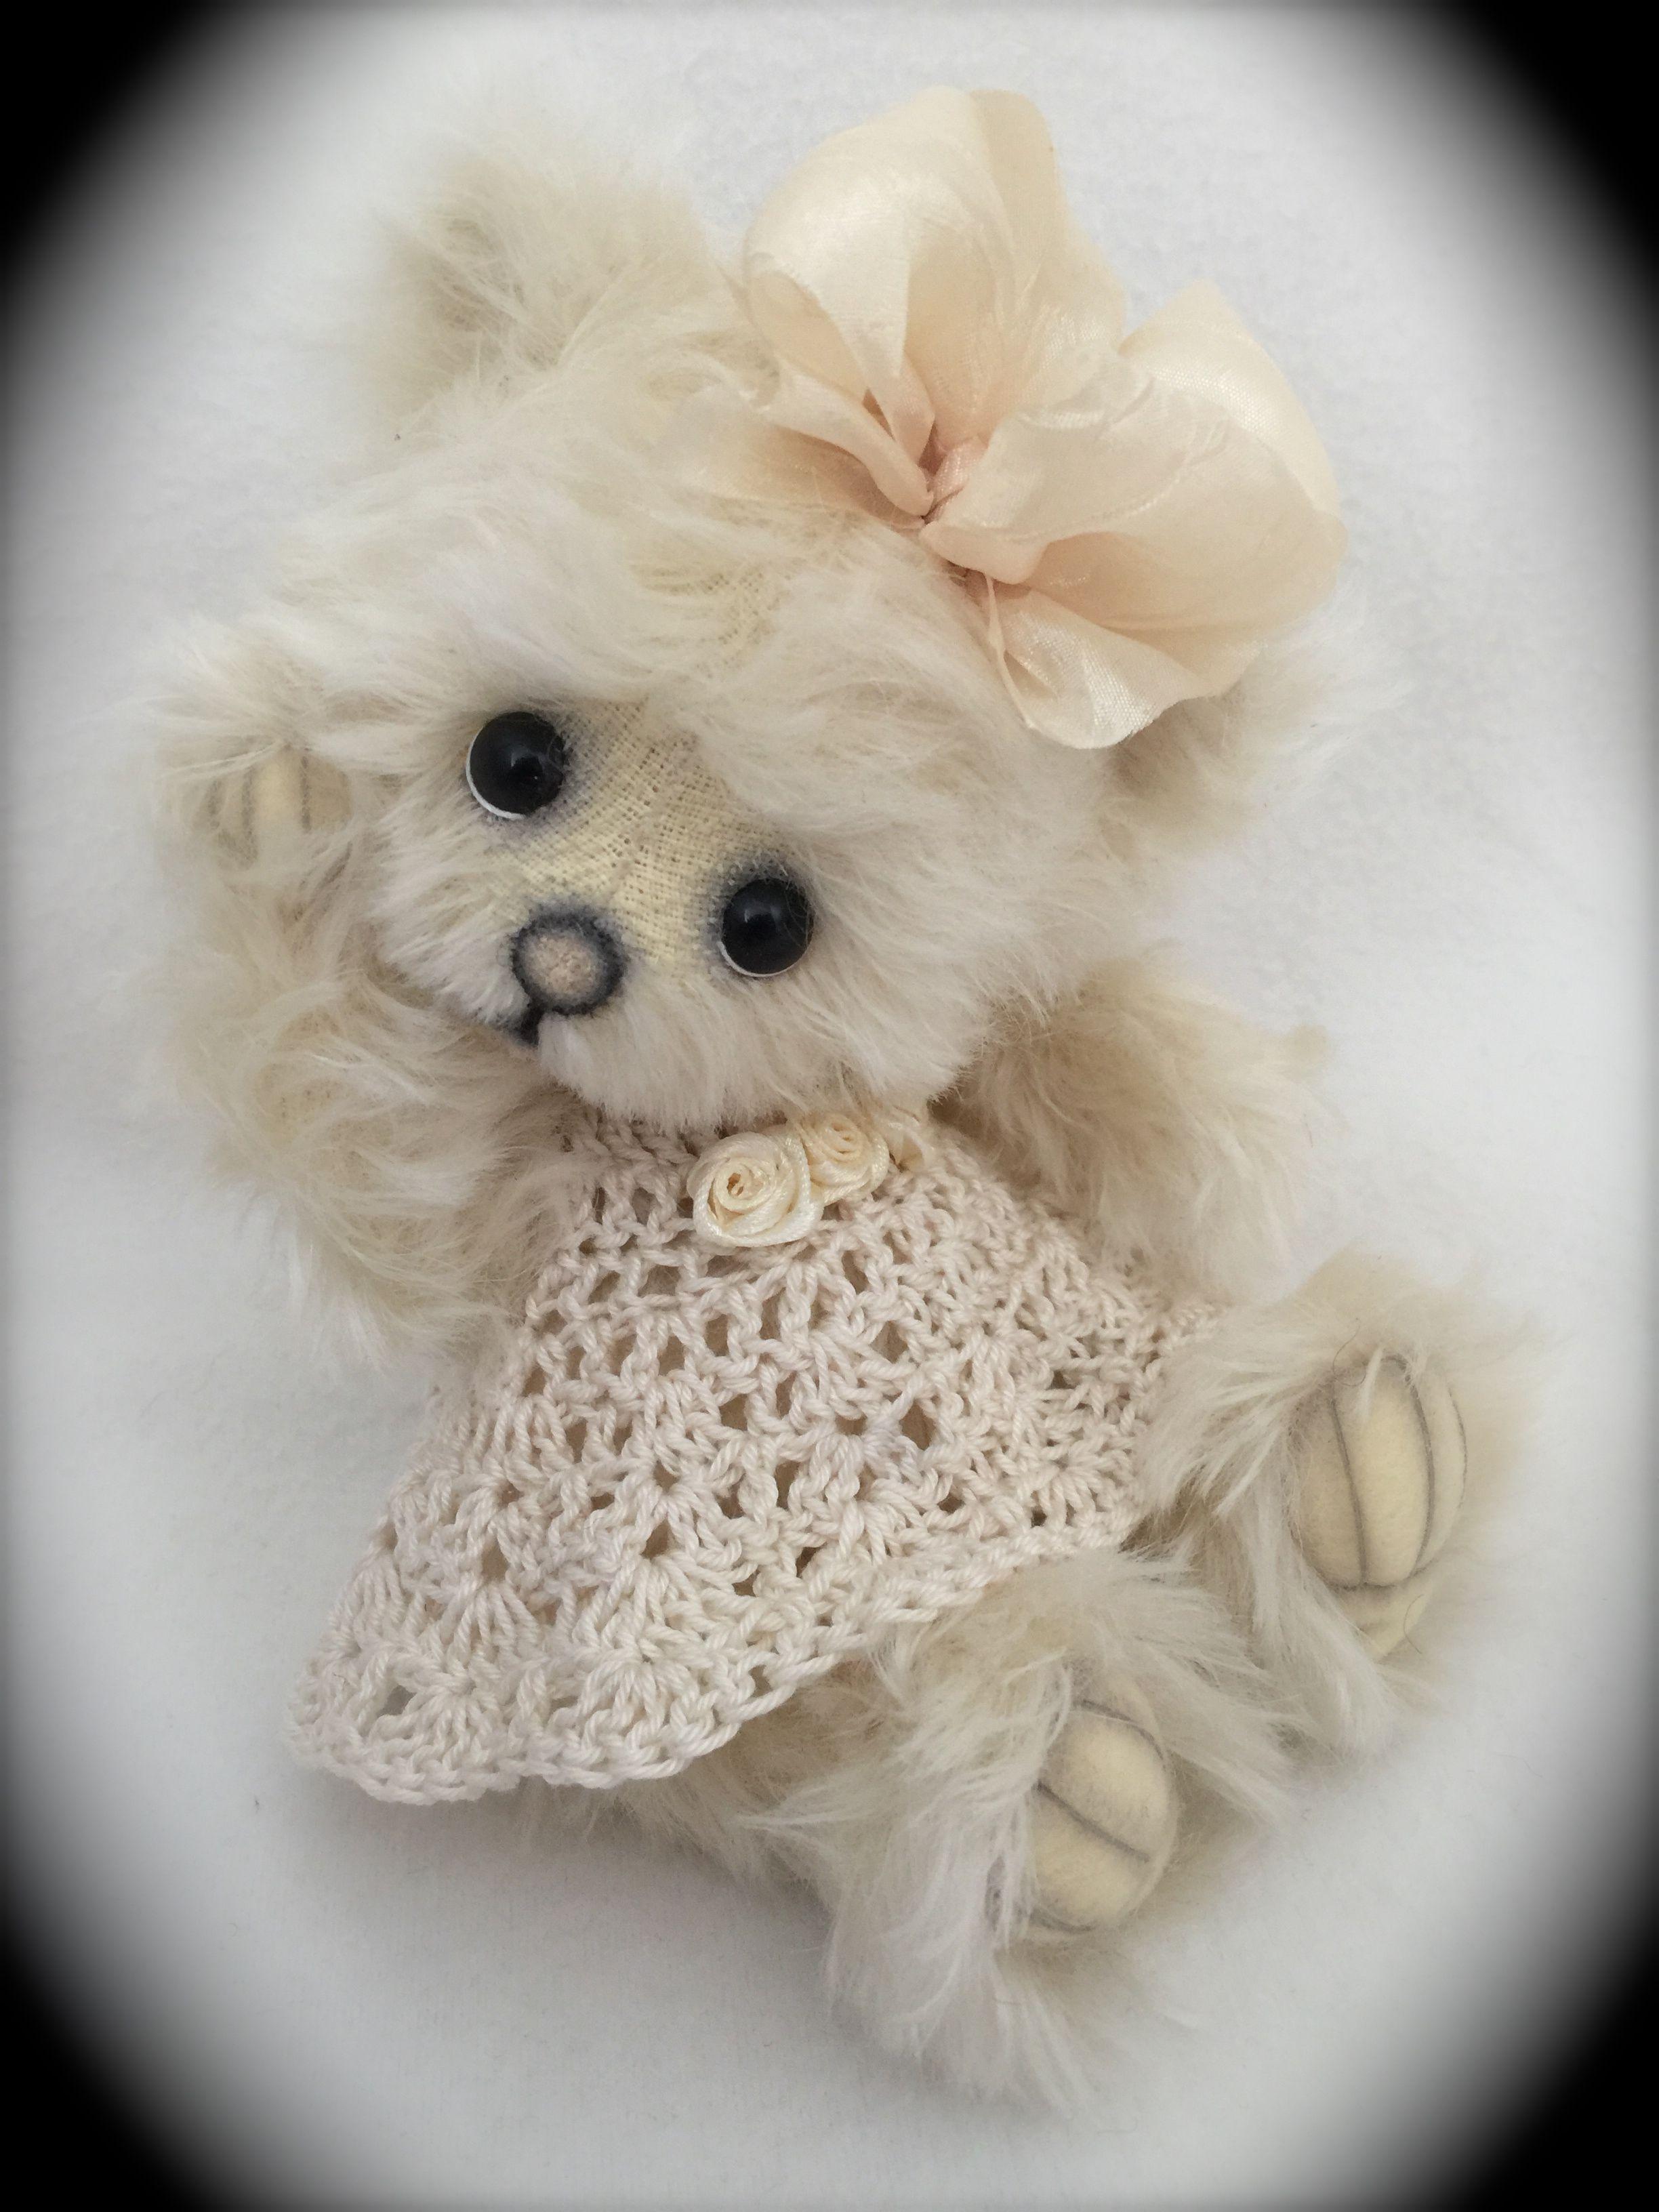 Just precious Cute Animals Teddy bear images, Teddy